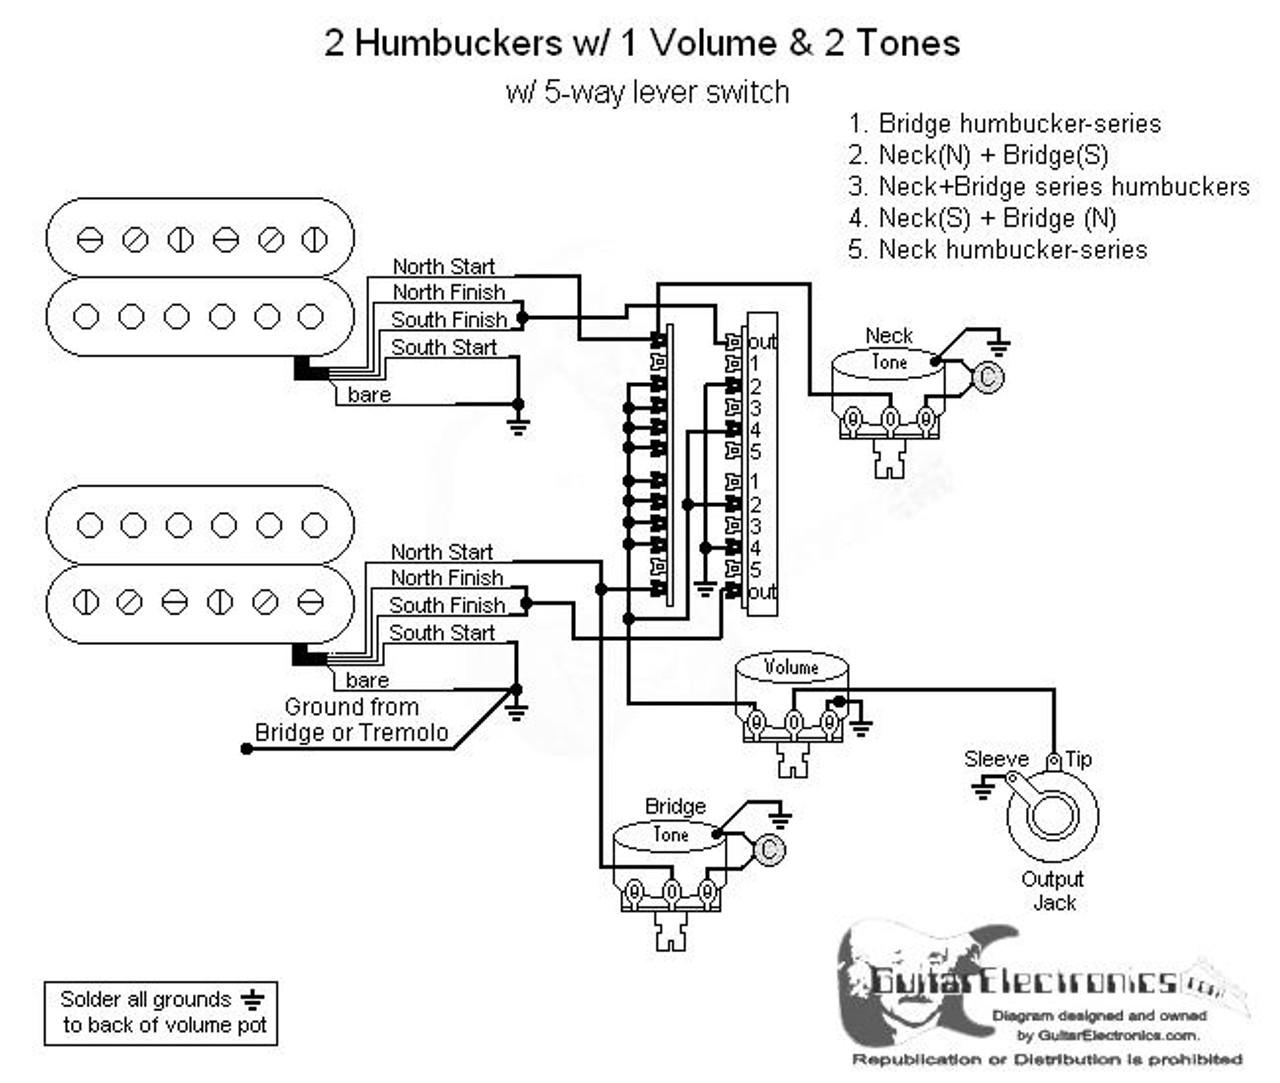 small resolution of 2 humbuckers 5 way lever switch 1 volume 2 tones 05fender strat wiring diagram 2 humbucker